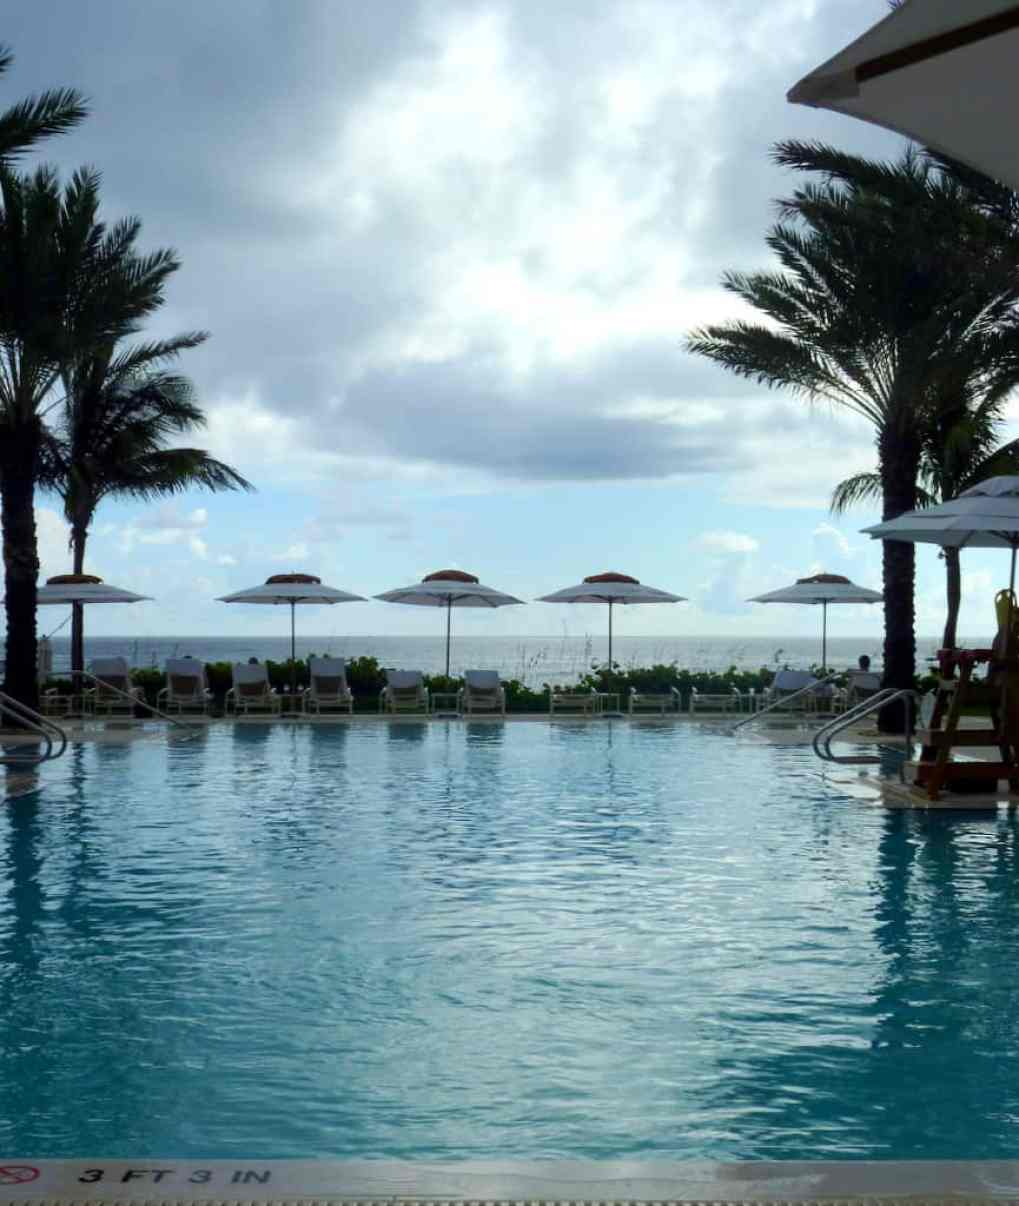 The Breakers swimming pool